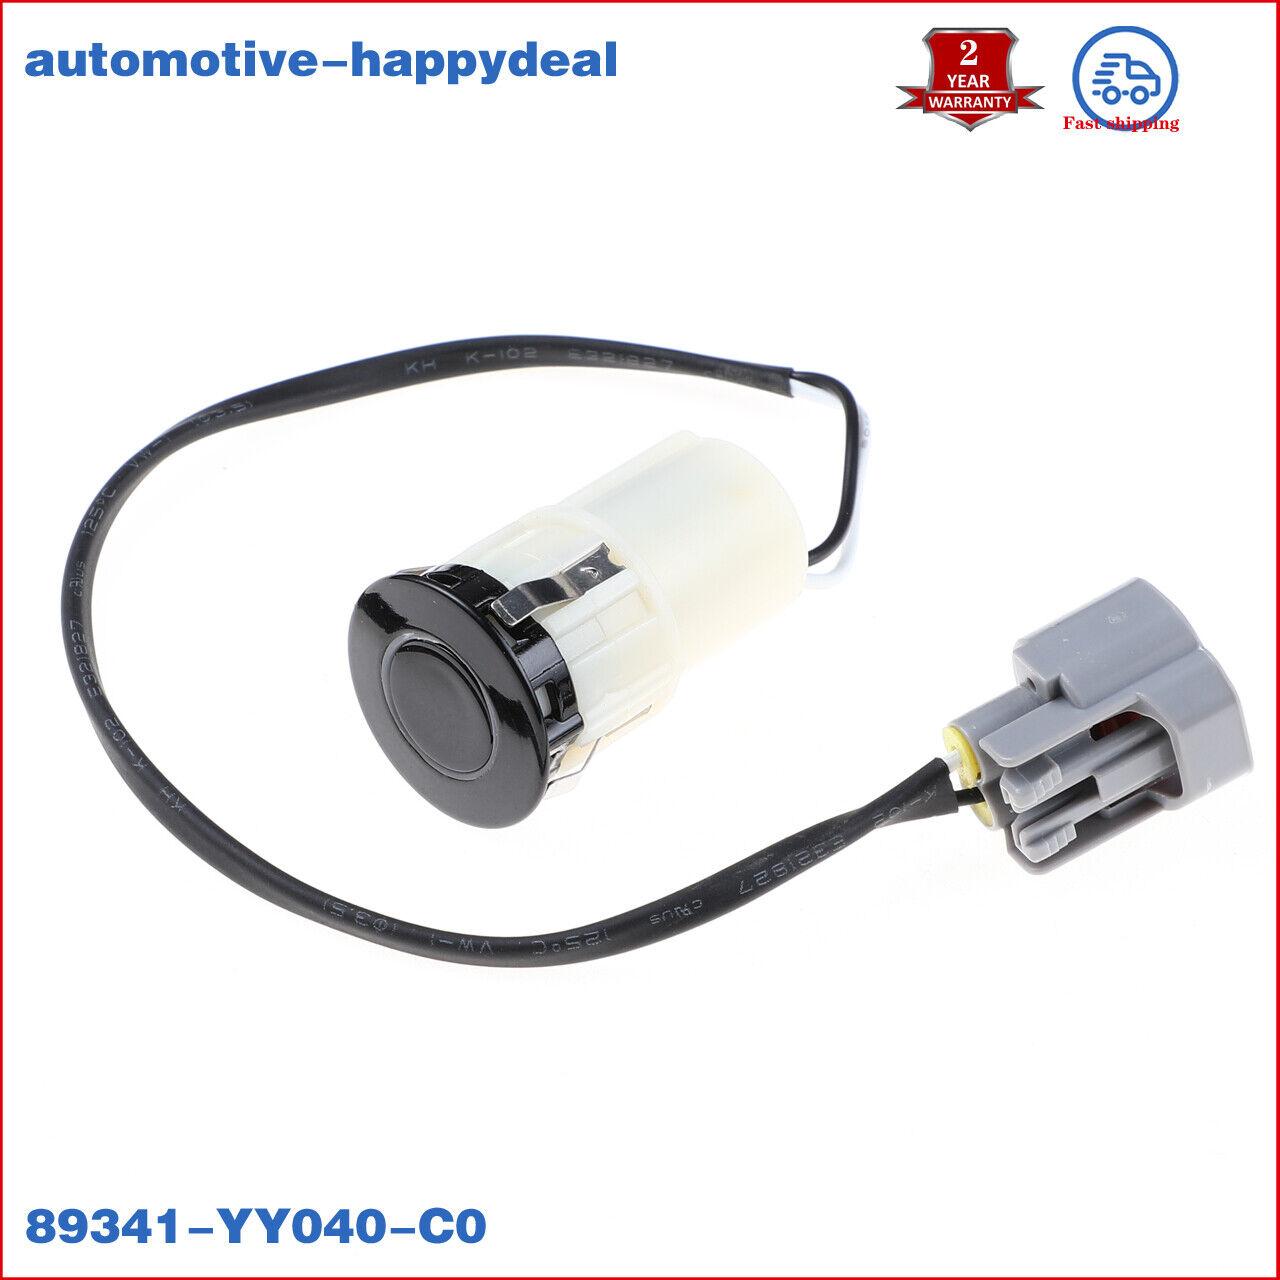 PDC Parking Sensor 6 Pin for Hyundai I20 2009-2015